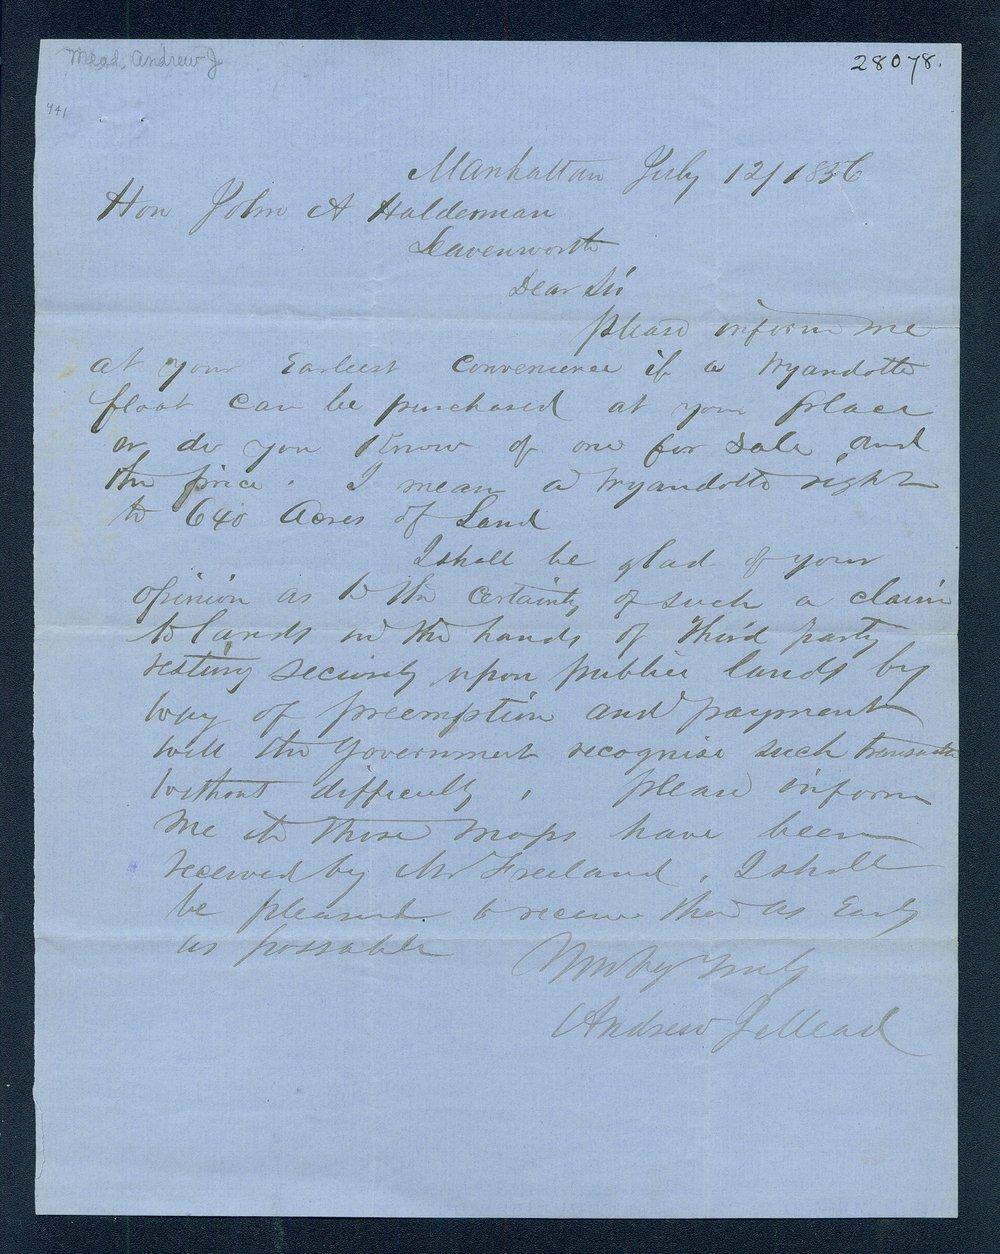 Andrew J. Mead to John A. Haldeman - 1